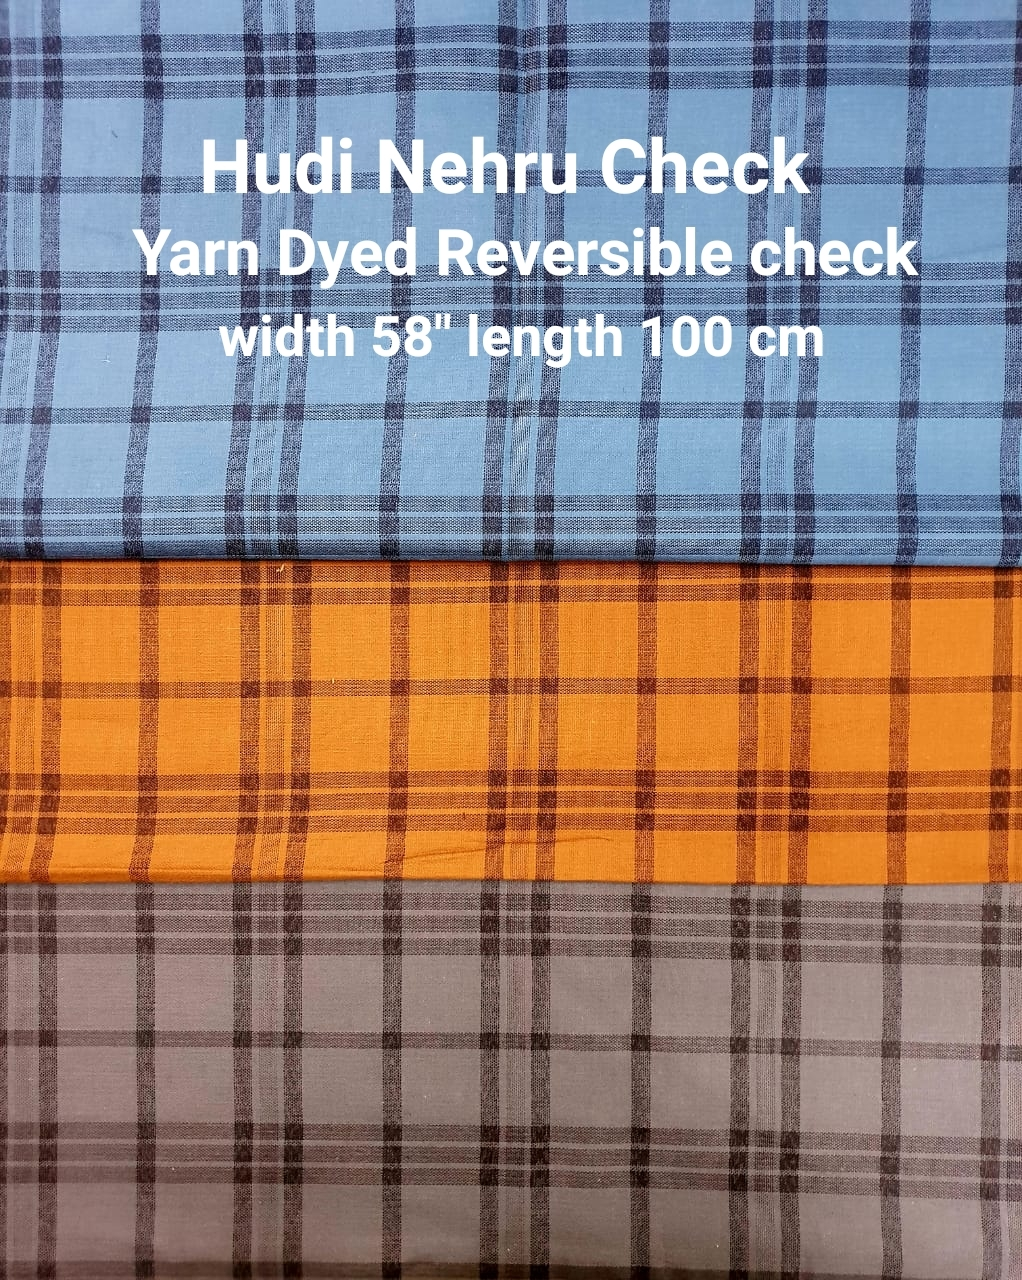 HUDI NEHRU CHECK yarn dyed reversible check